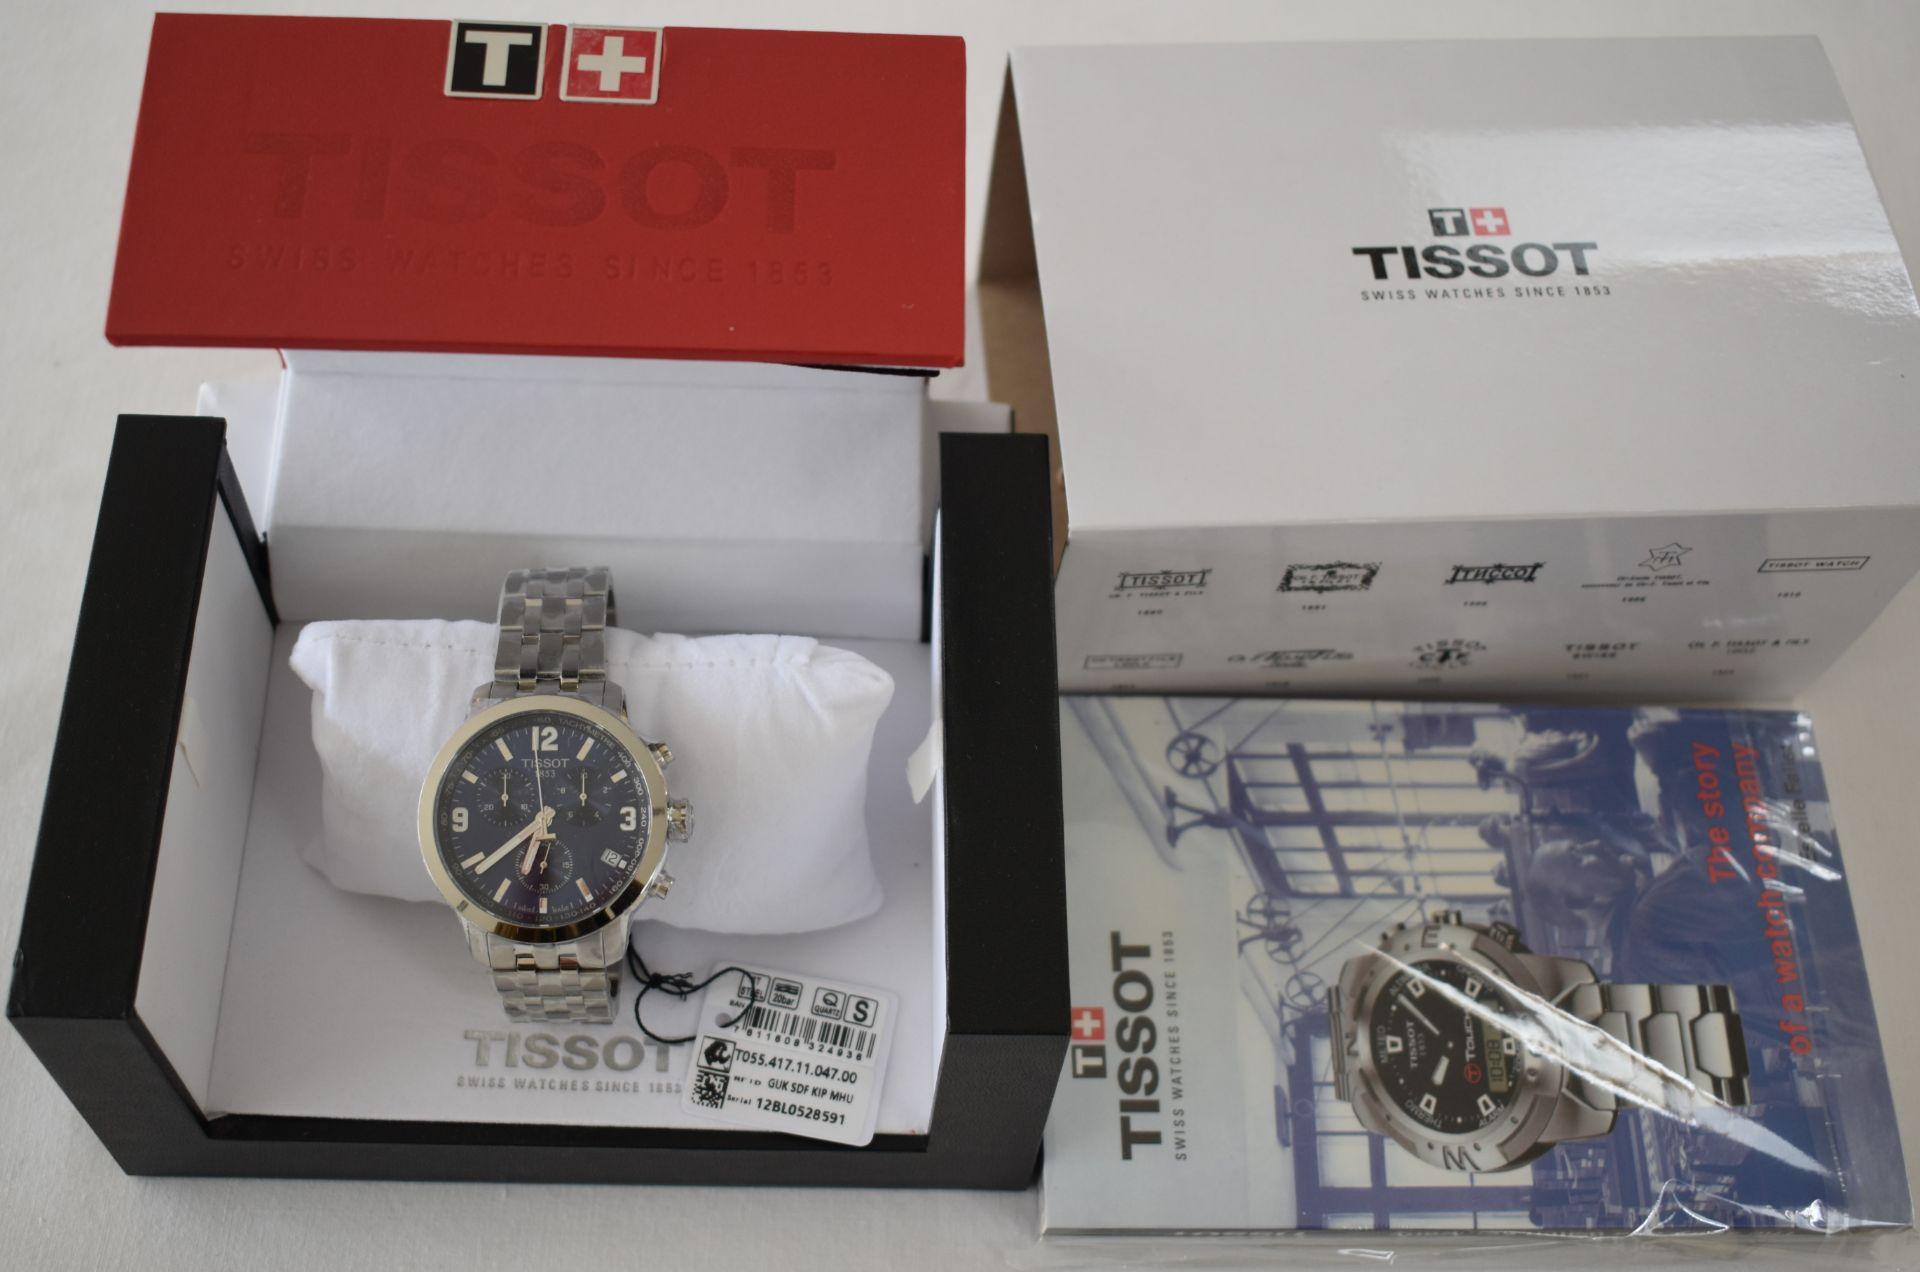 Tissot Men's Watch TO55.417.11.047.00